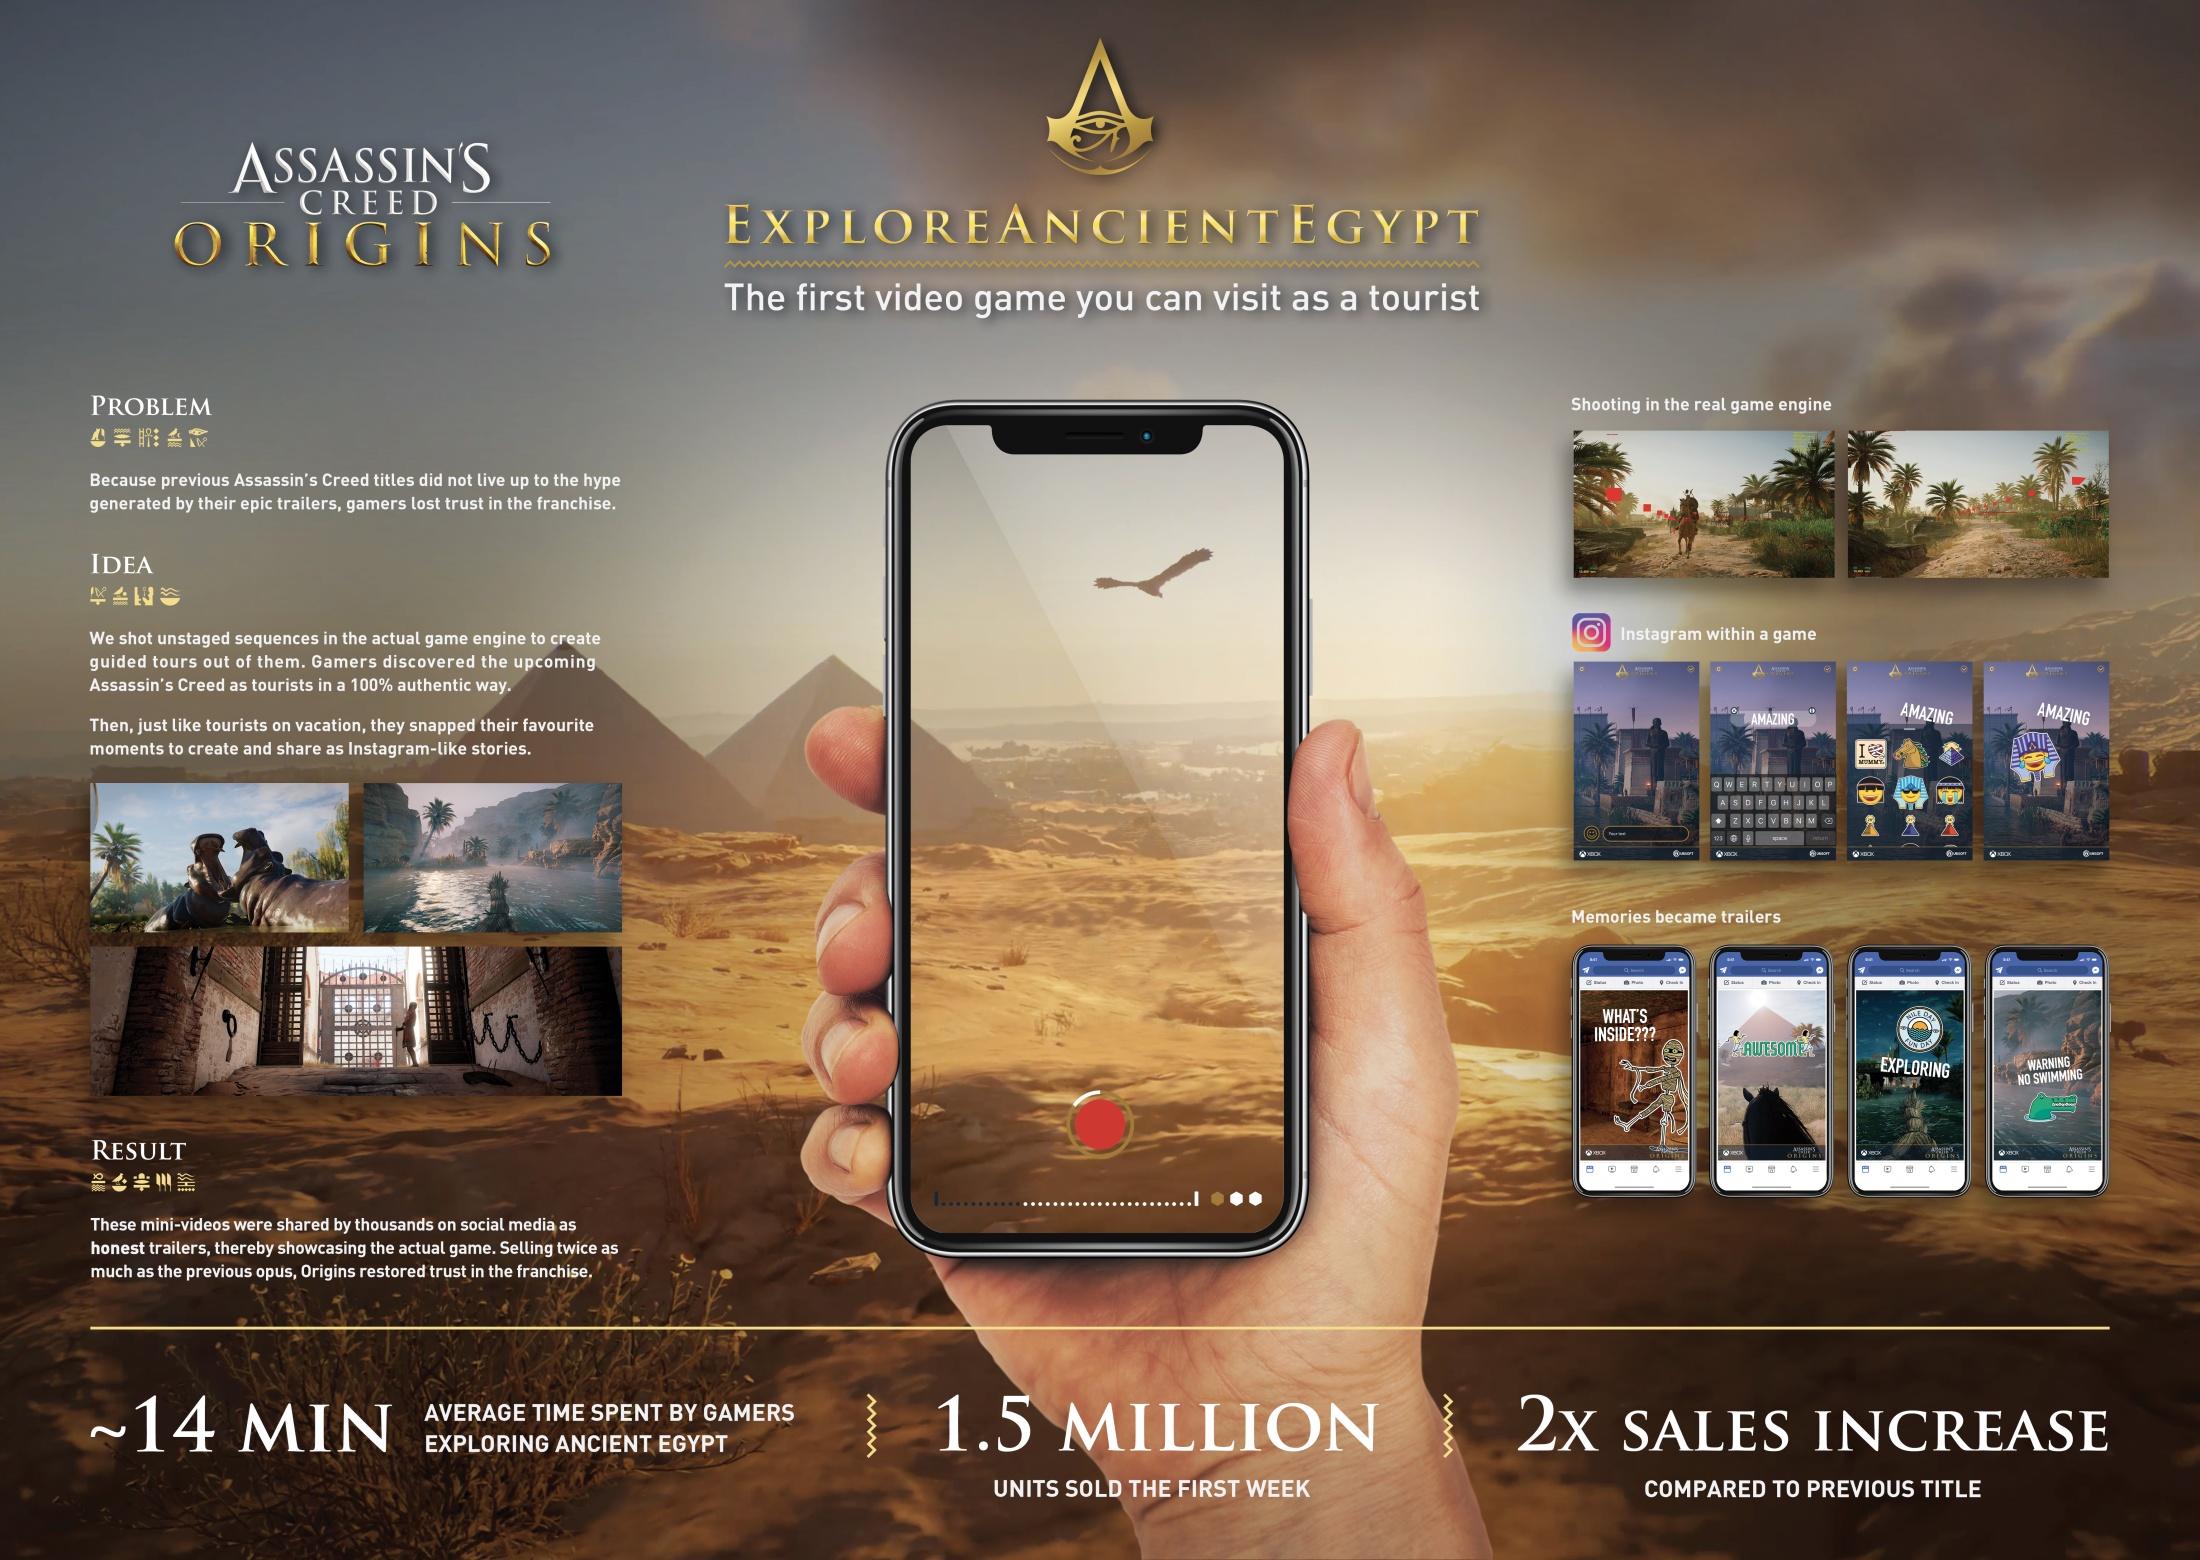 Thumbnail for Explore Ancient Egypt